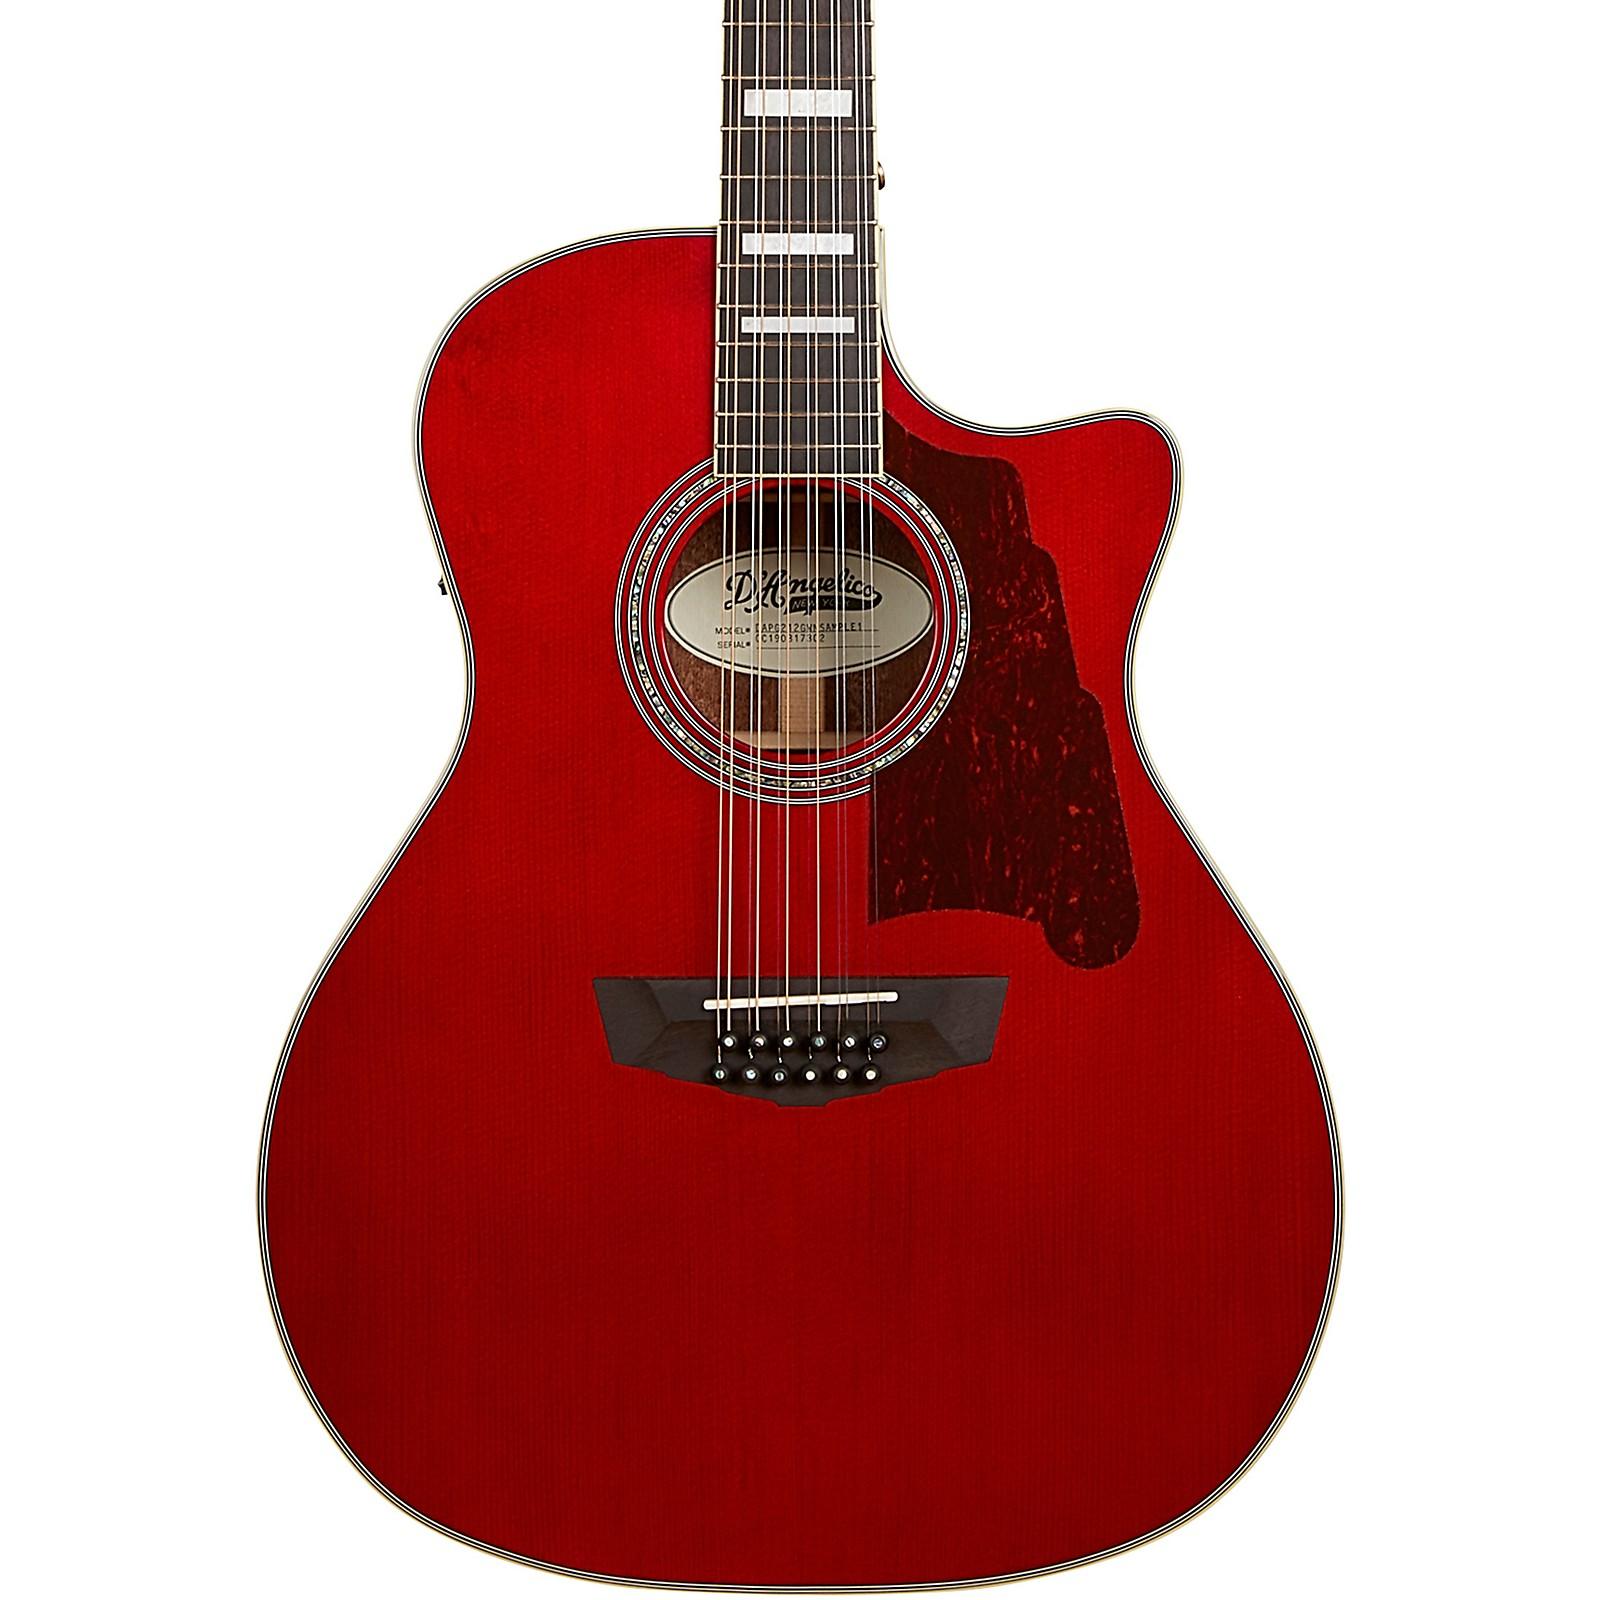 Open Box D'Angelico Premier Fulton Grand Auditorium 12-String Acoustic-Electric Guitar